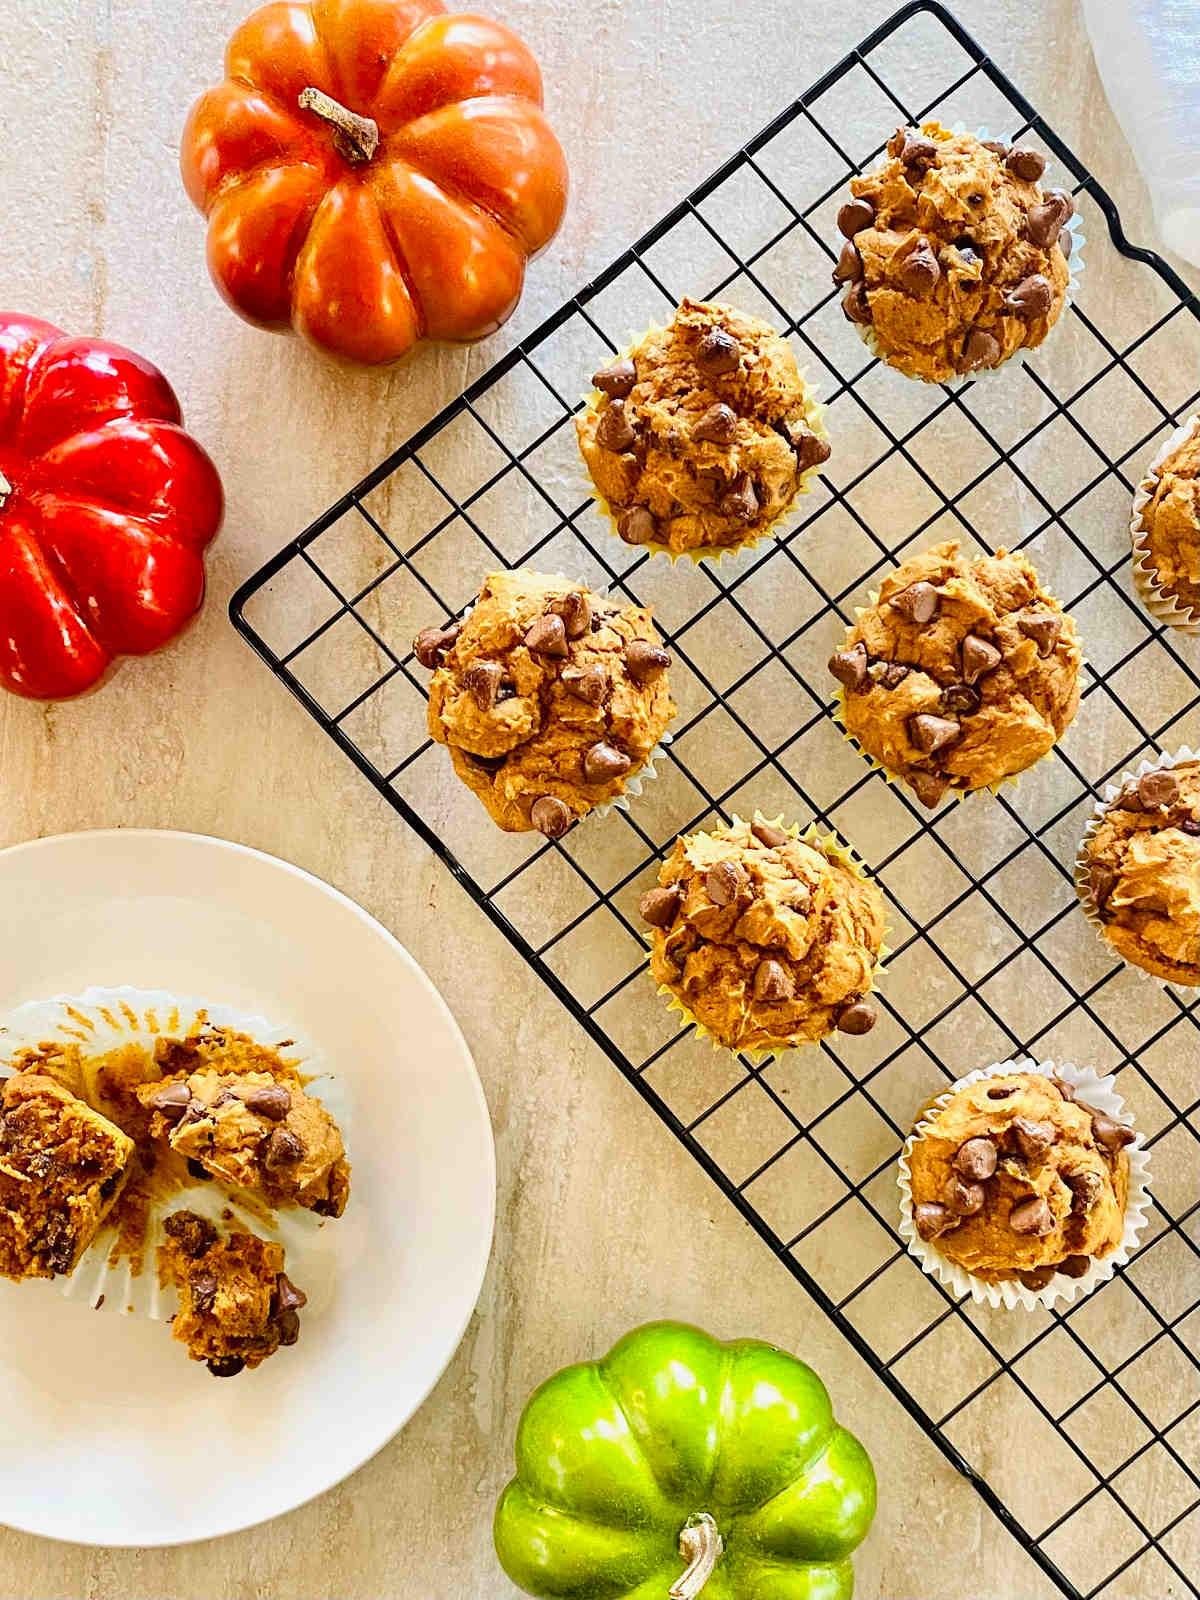 3 ingredient pumpkin muffins on a baking rack next to colored pumpkins